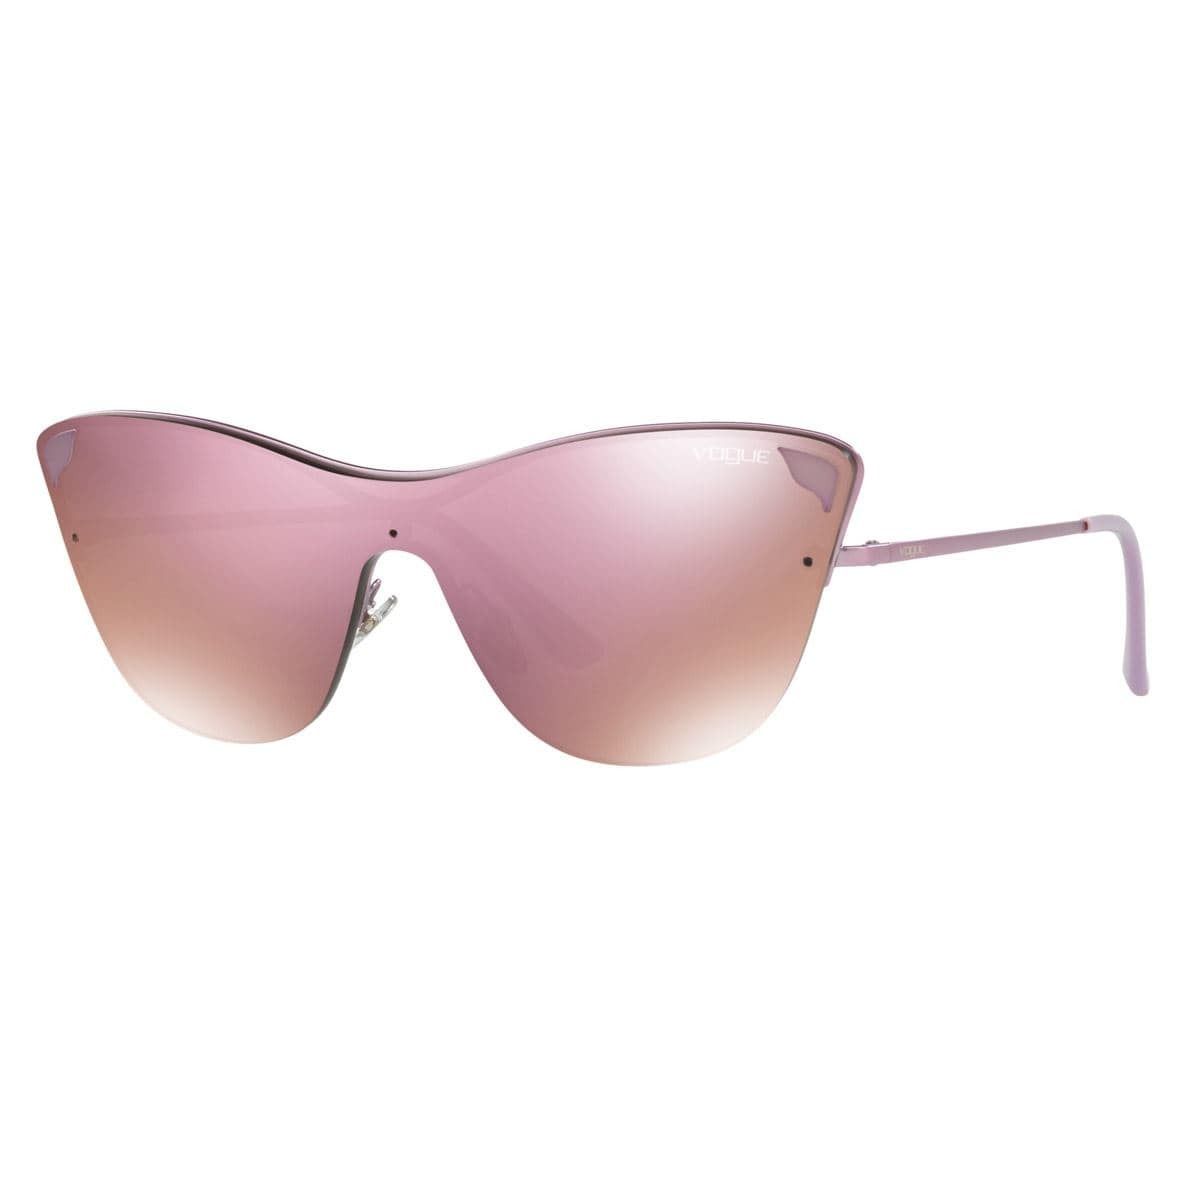 321e77129f Vogue Rosa-marrón Espejado Armazón Rosa Mate - $ 3,244.00 en Mercado ...